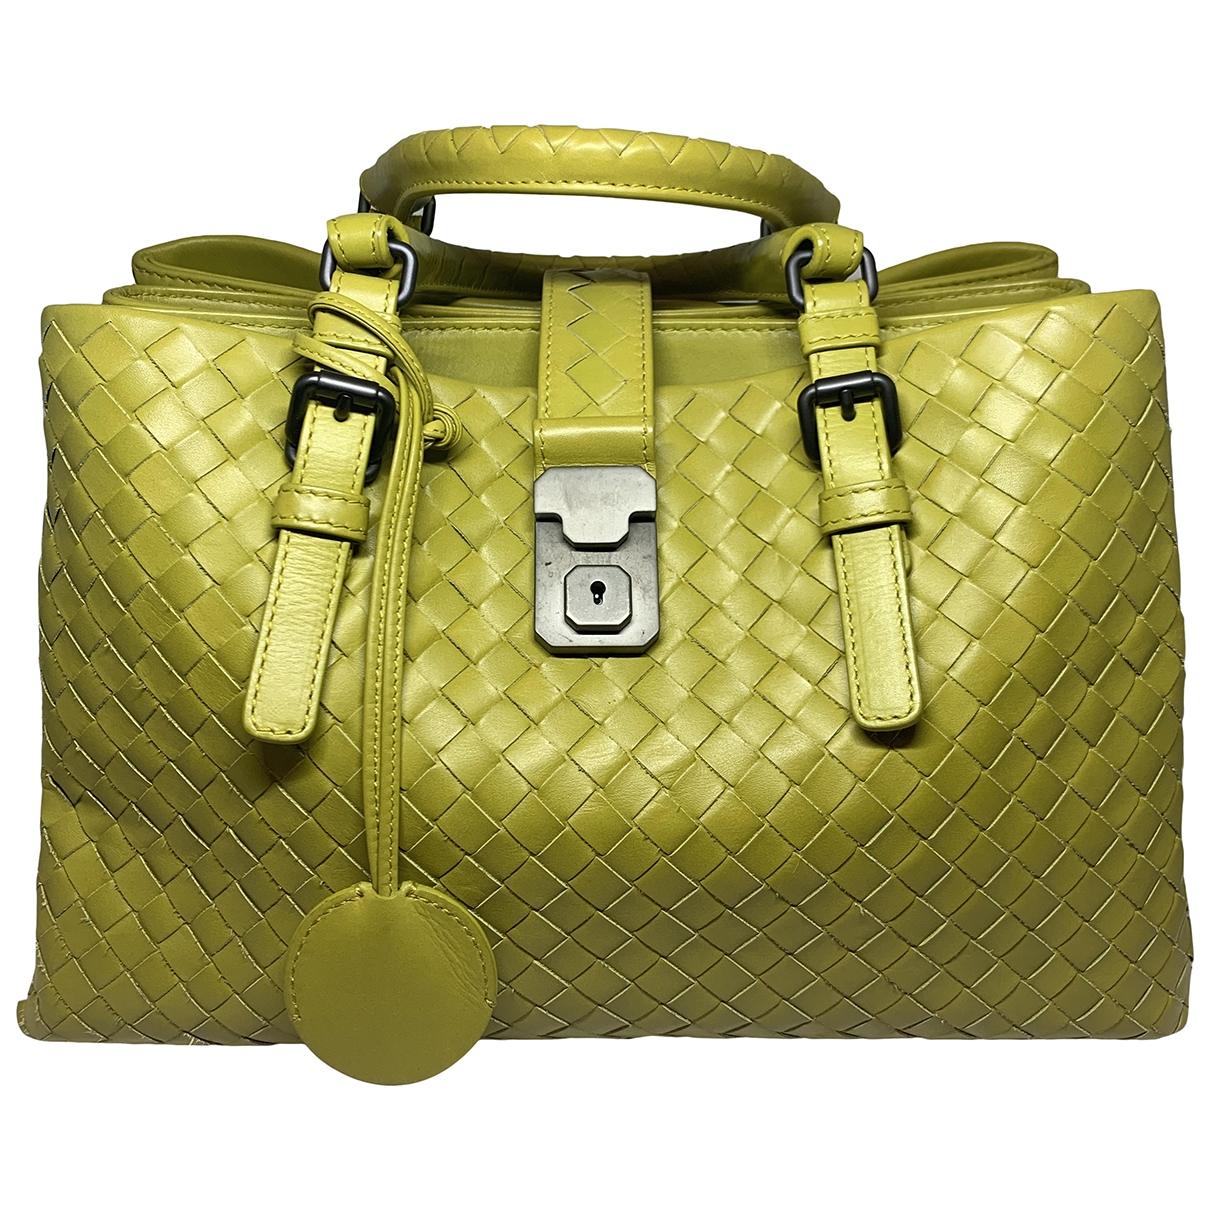 Bottega Veneta Roma Handtasche in  Gelb Leder